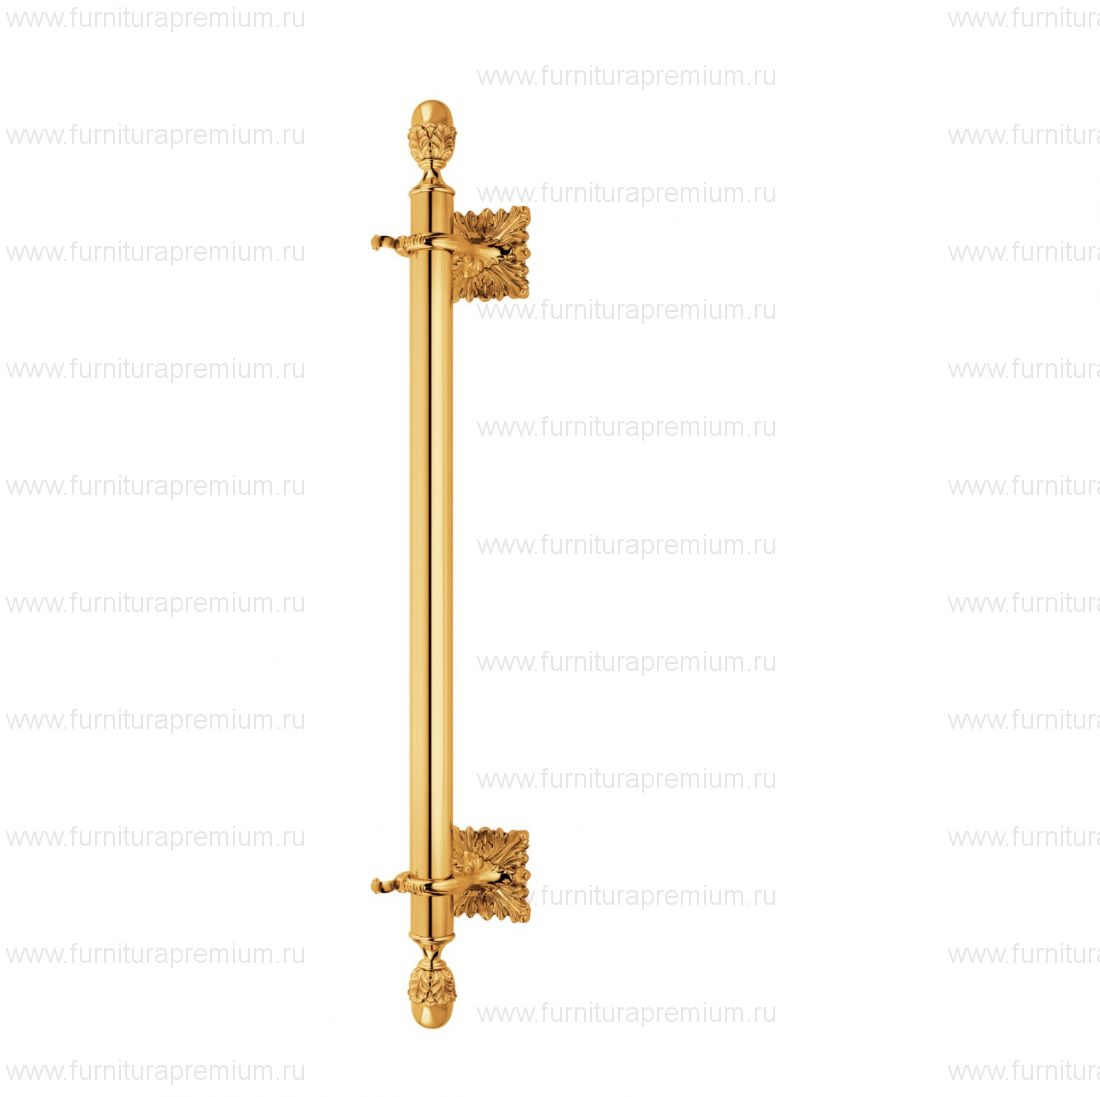 Ручка-скоба Enrico Cassina C49100. Длина 880 мм.